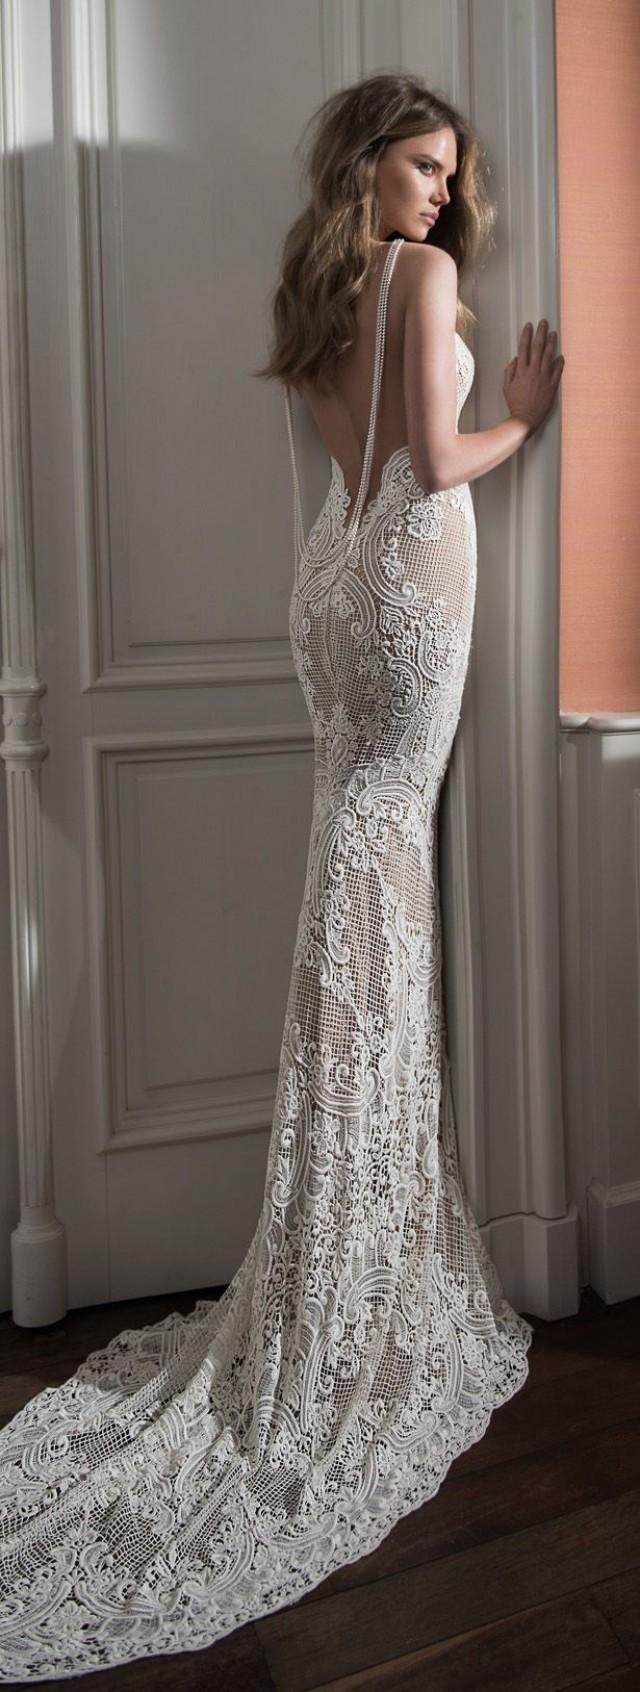 wedding dresses by berta bridal fall 2015 belle the magazine 2399718 weddbook. Black Bedroom Furniture Sets. Home Design Ideas